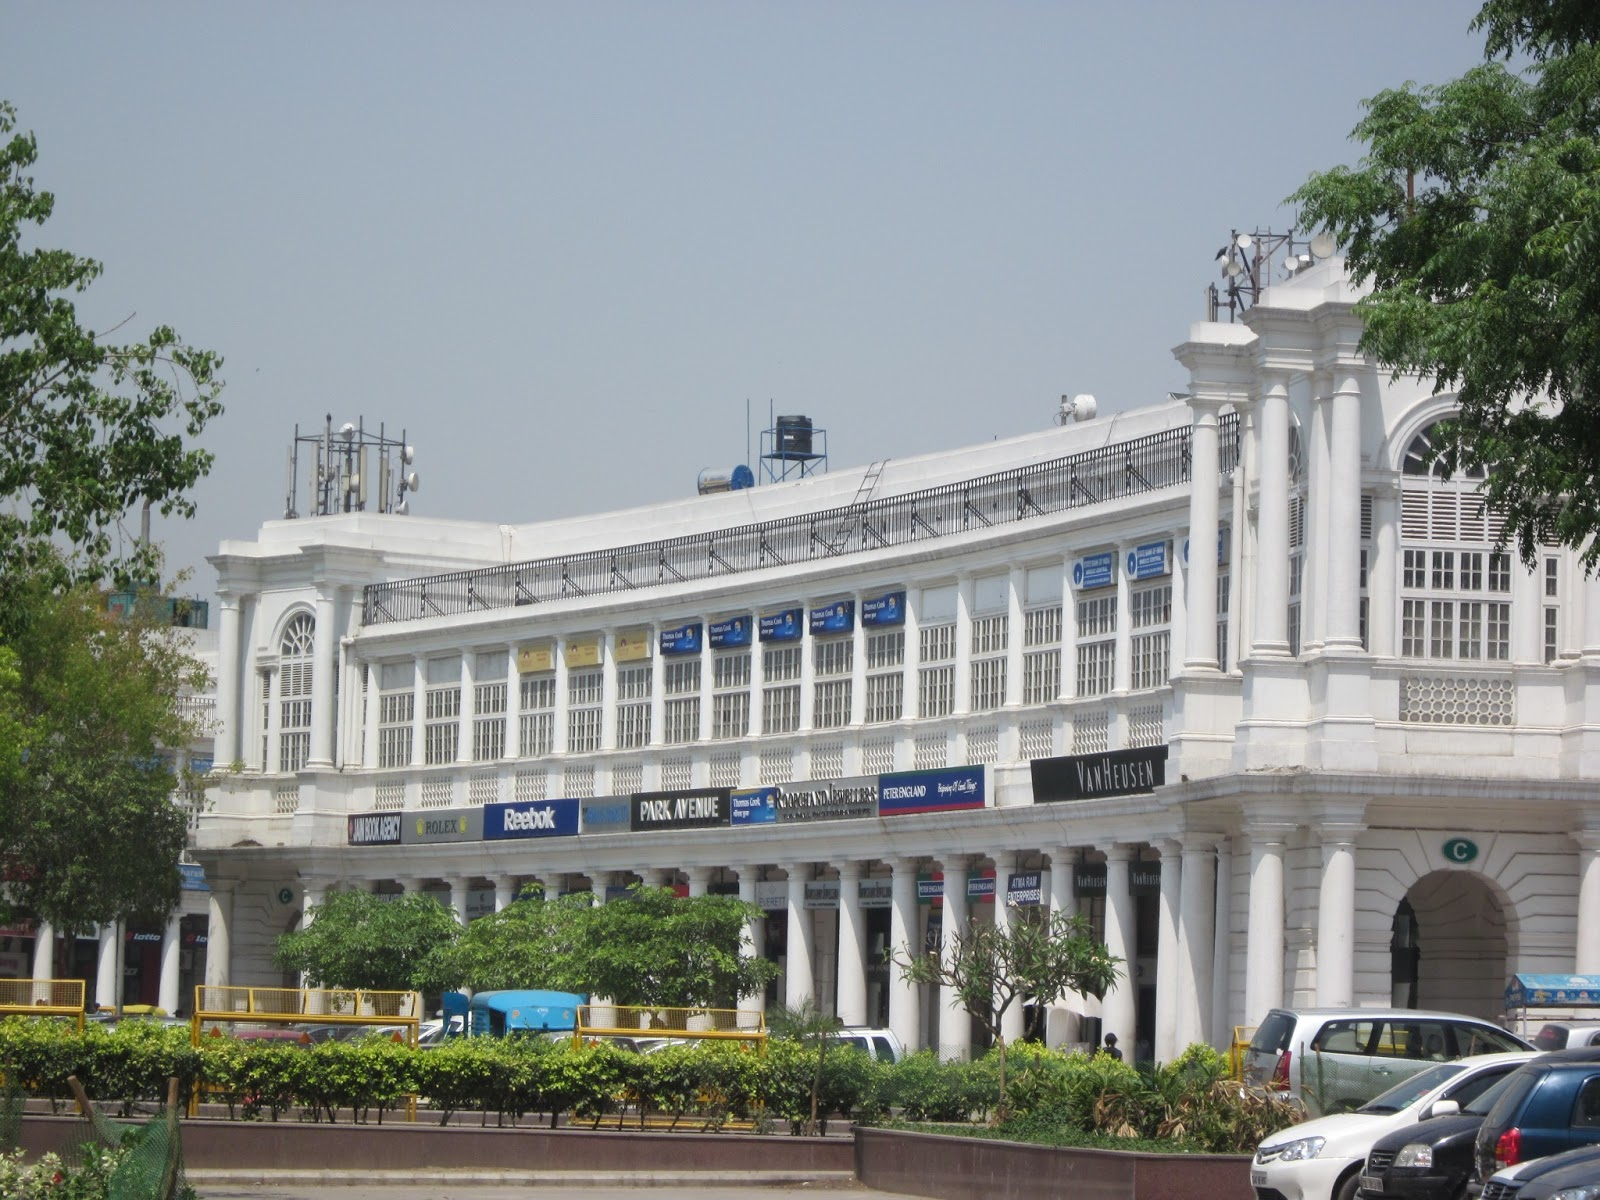 For the love of architecture india rediscovering for Spaces architecture studio delhi